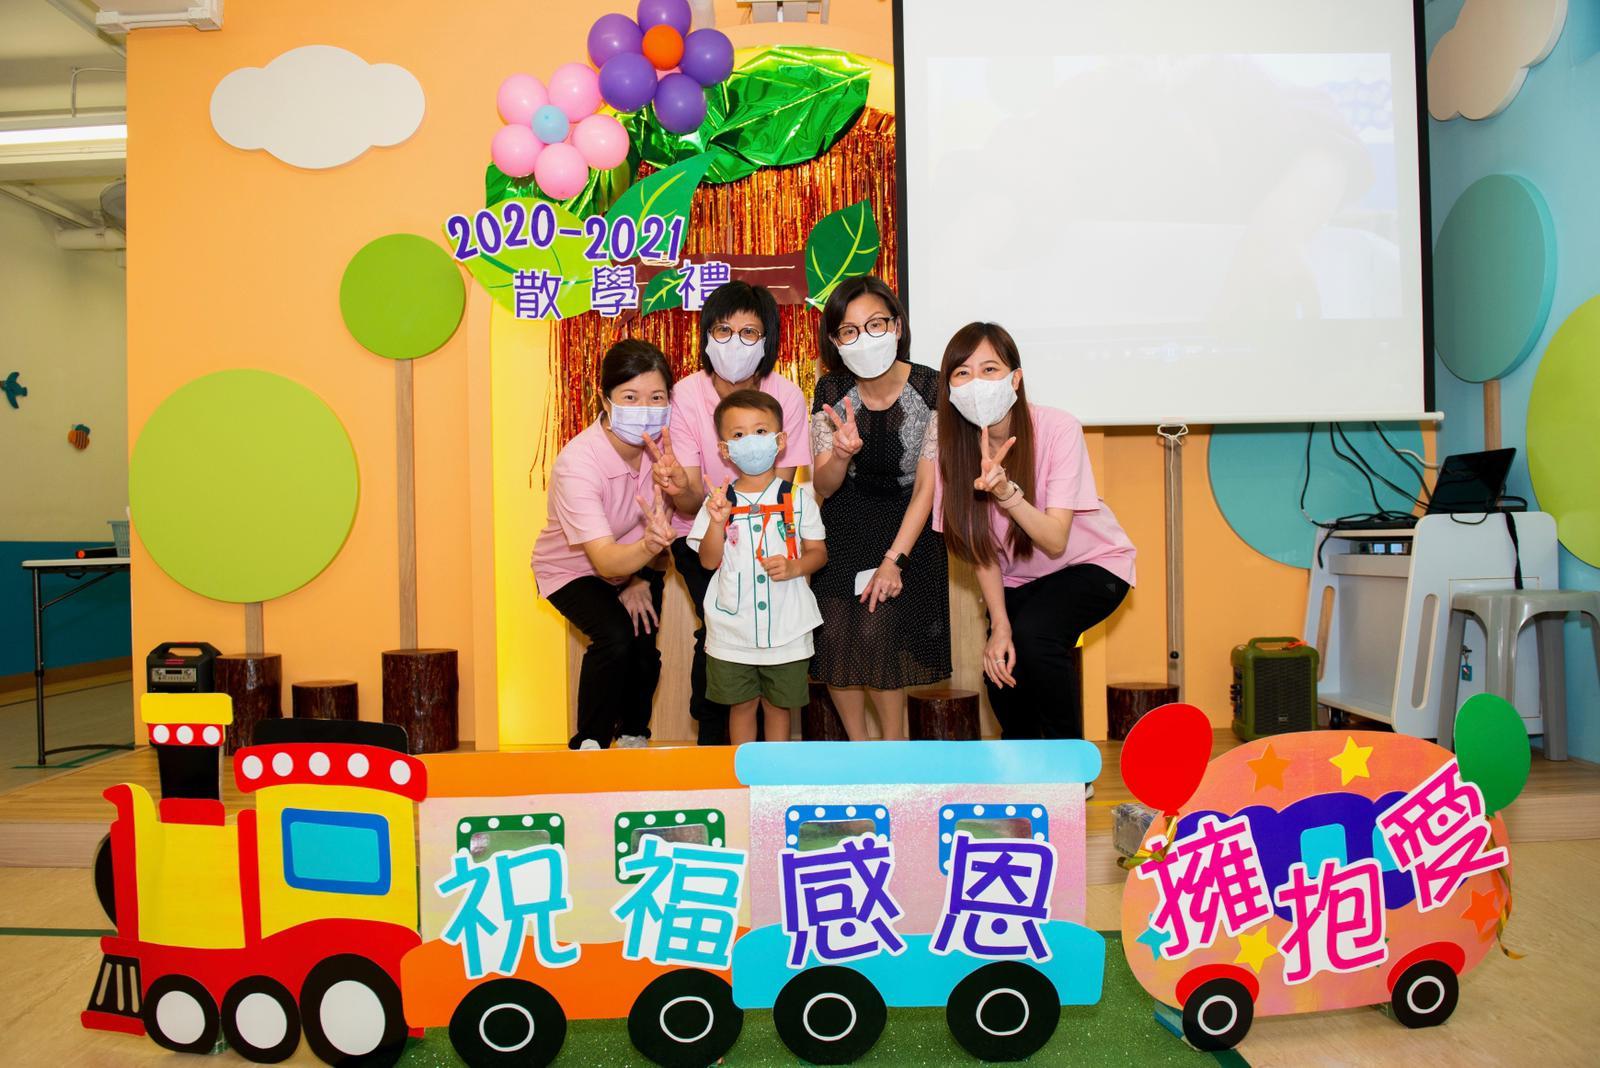 http://npmc.edu.hk/sites/default/files/37_0.jpg